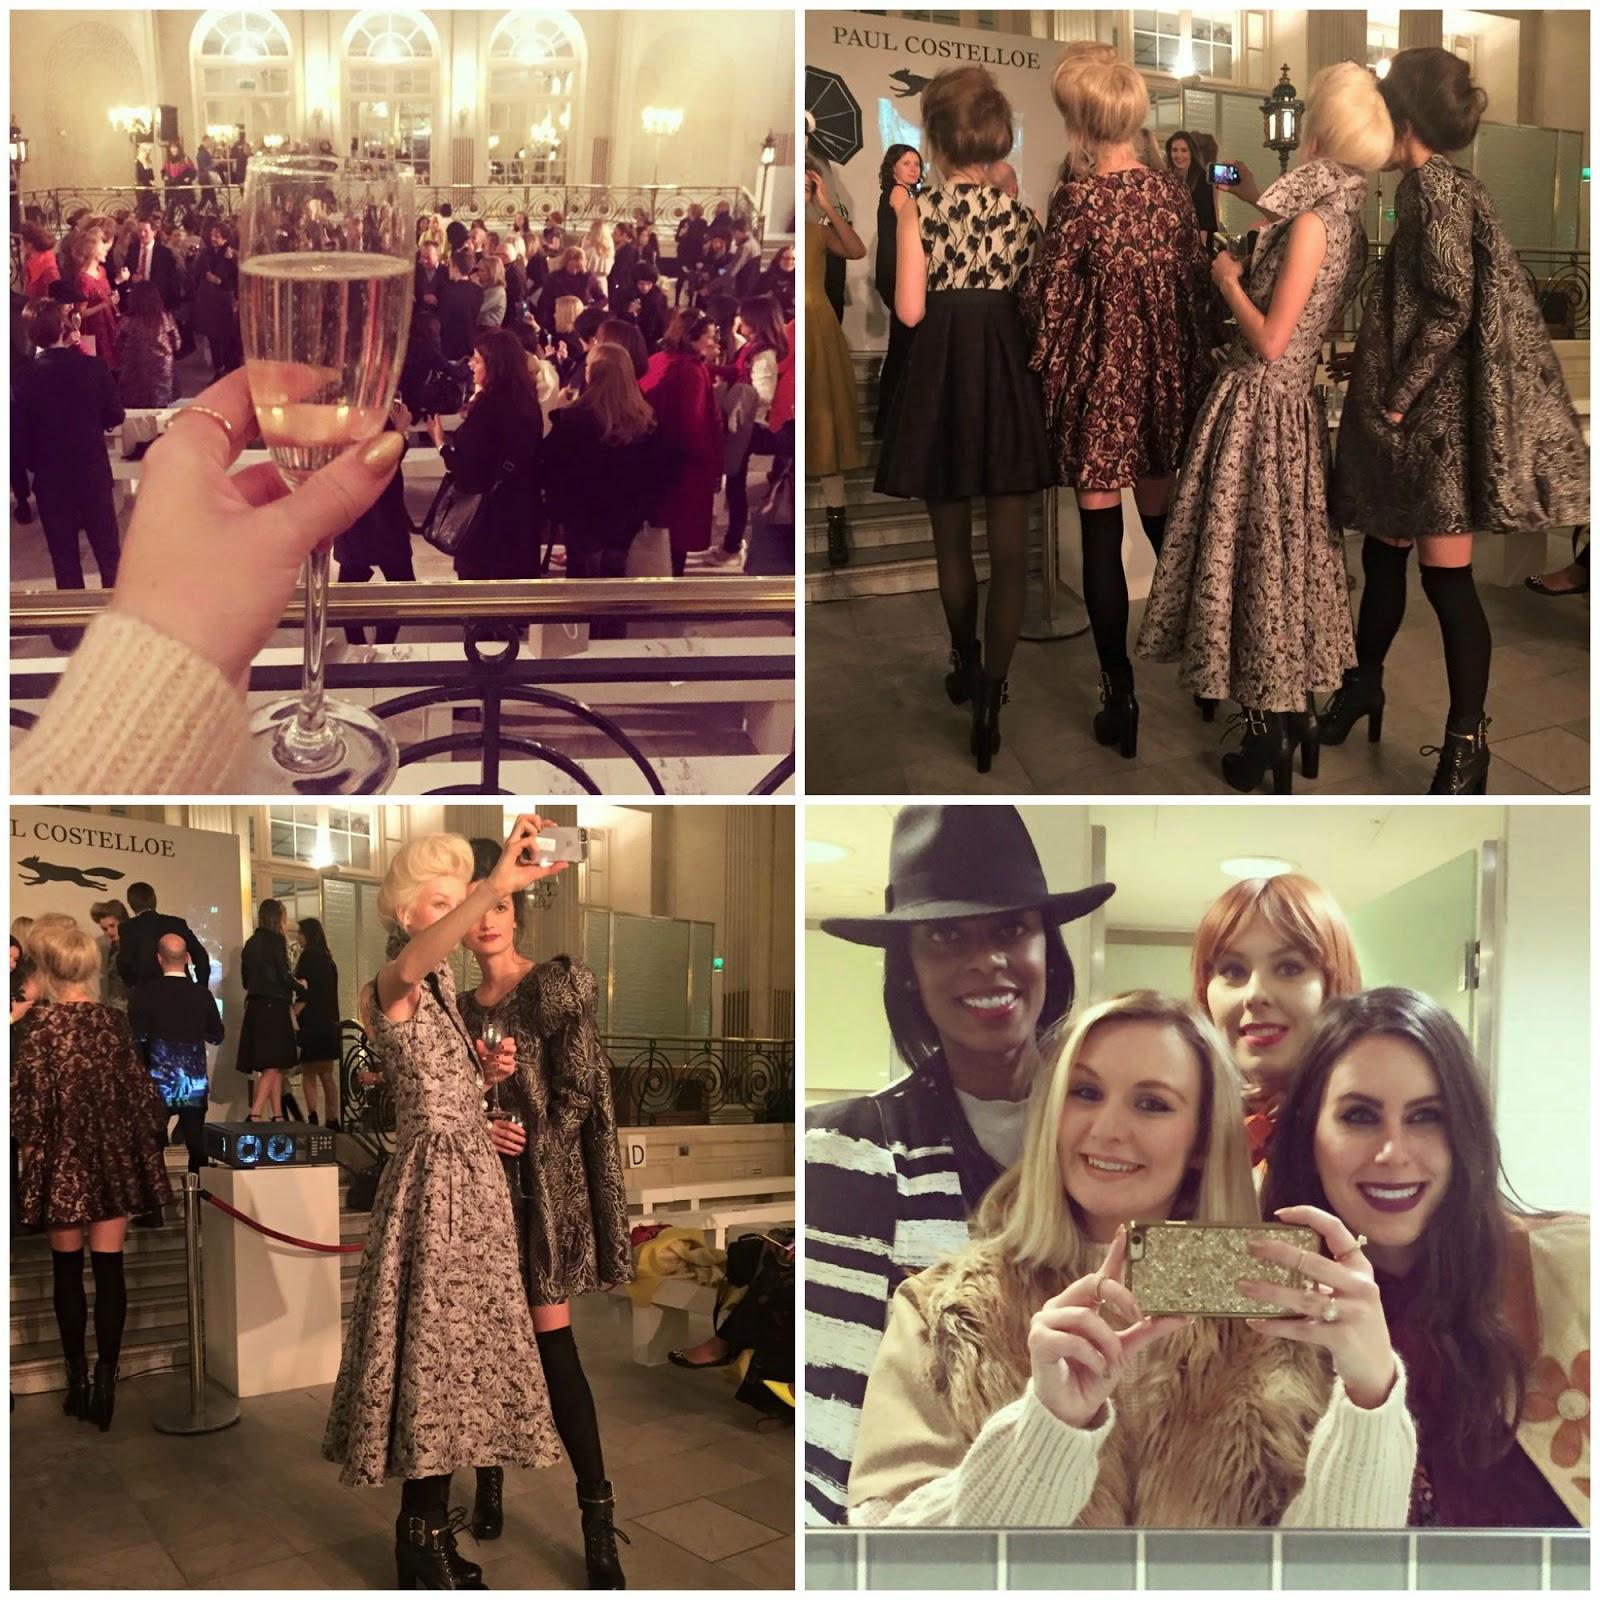 LFW AW15 Snapshots: Photo Diary, mode madeleine, fashion blogger, LFW, AW15, london fashion week, seventies, styling, catwalk, fashion week, felder felder, bora aksu, red hot sunglasses, sam faires, michelle keegan, rosie londoner, paul costelloe